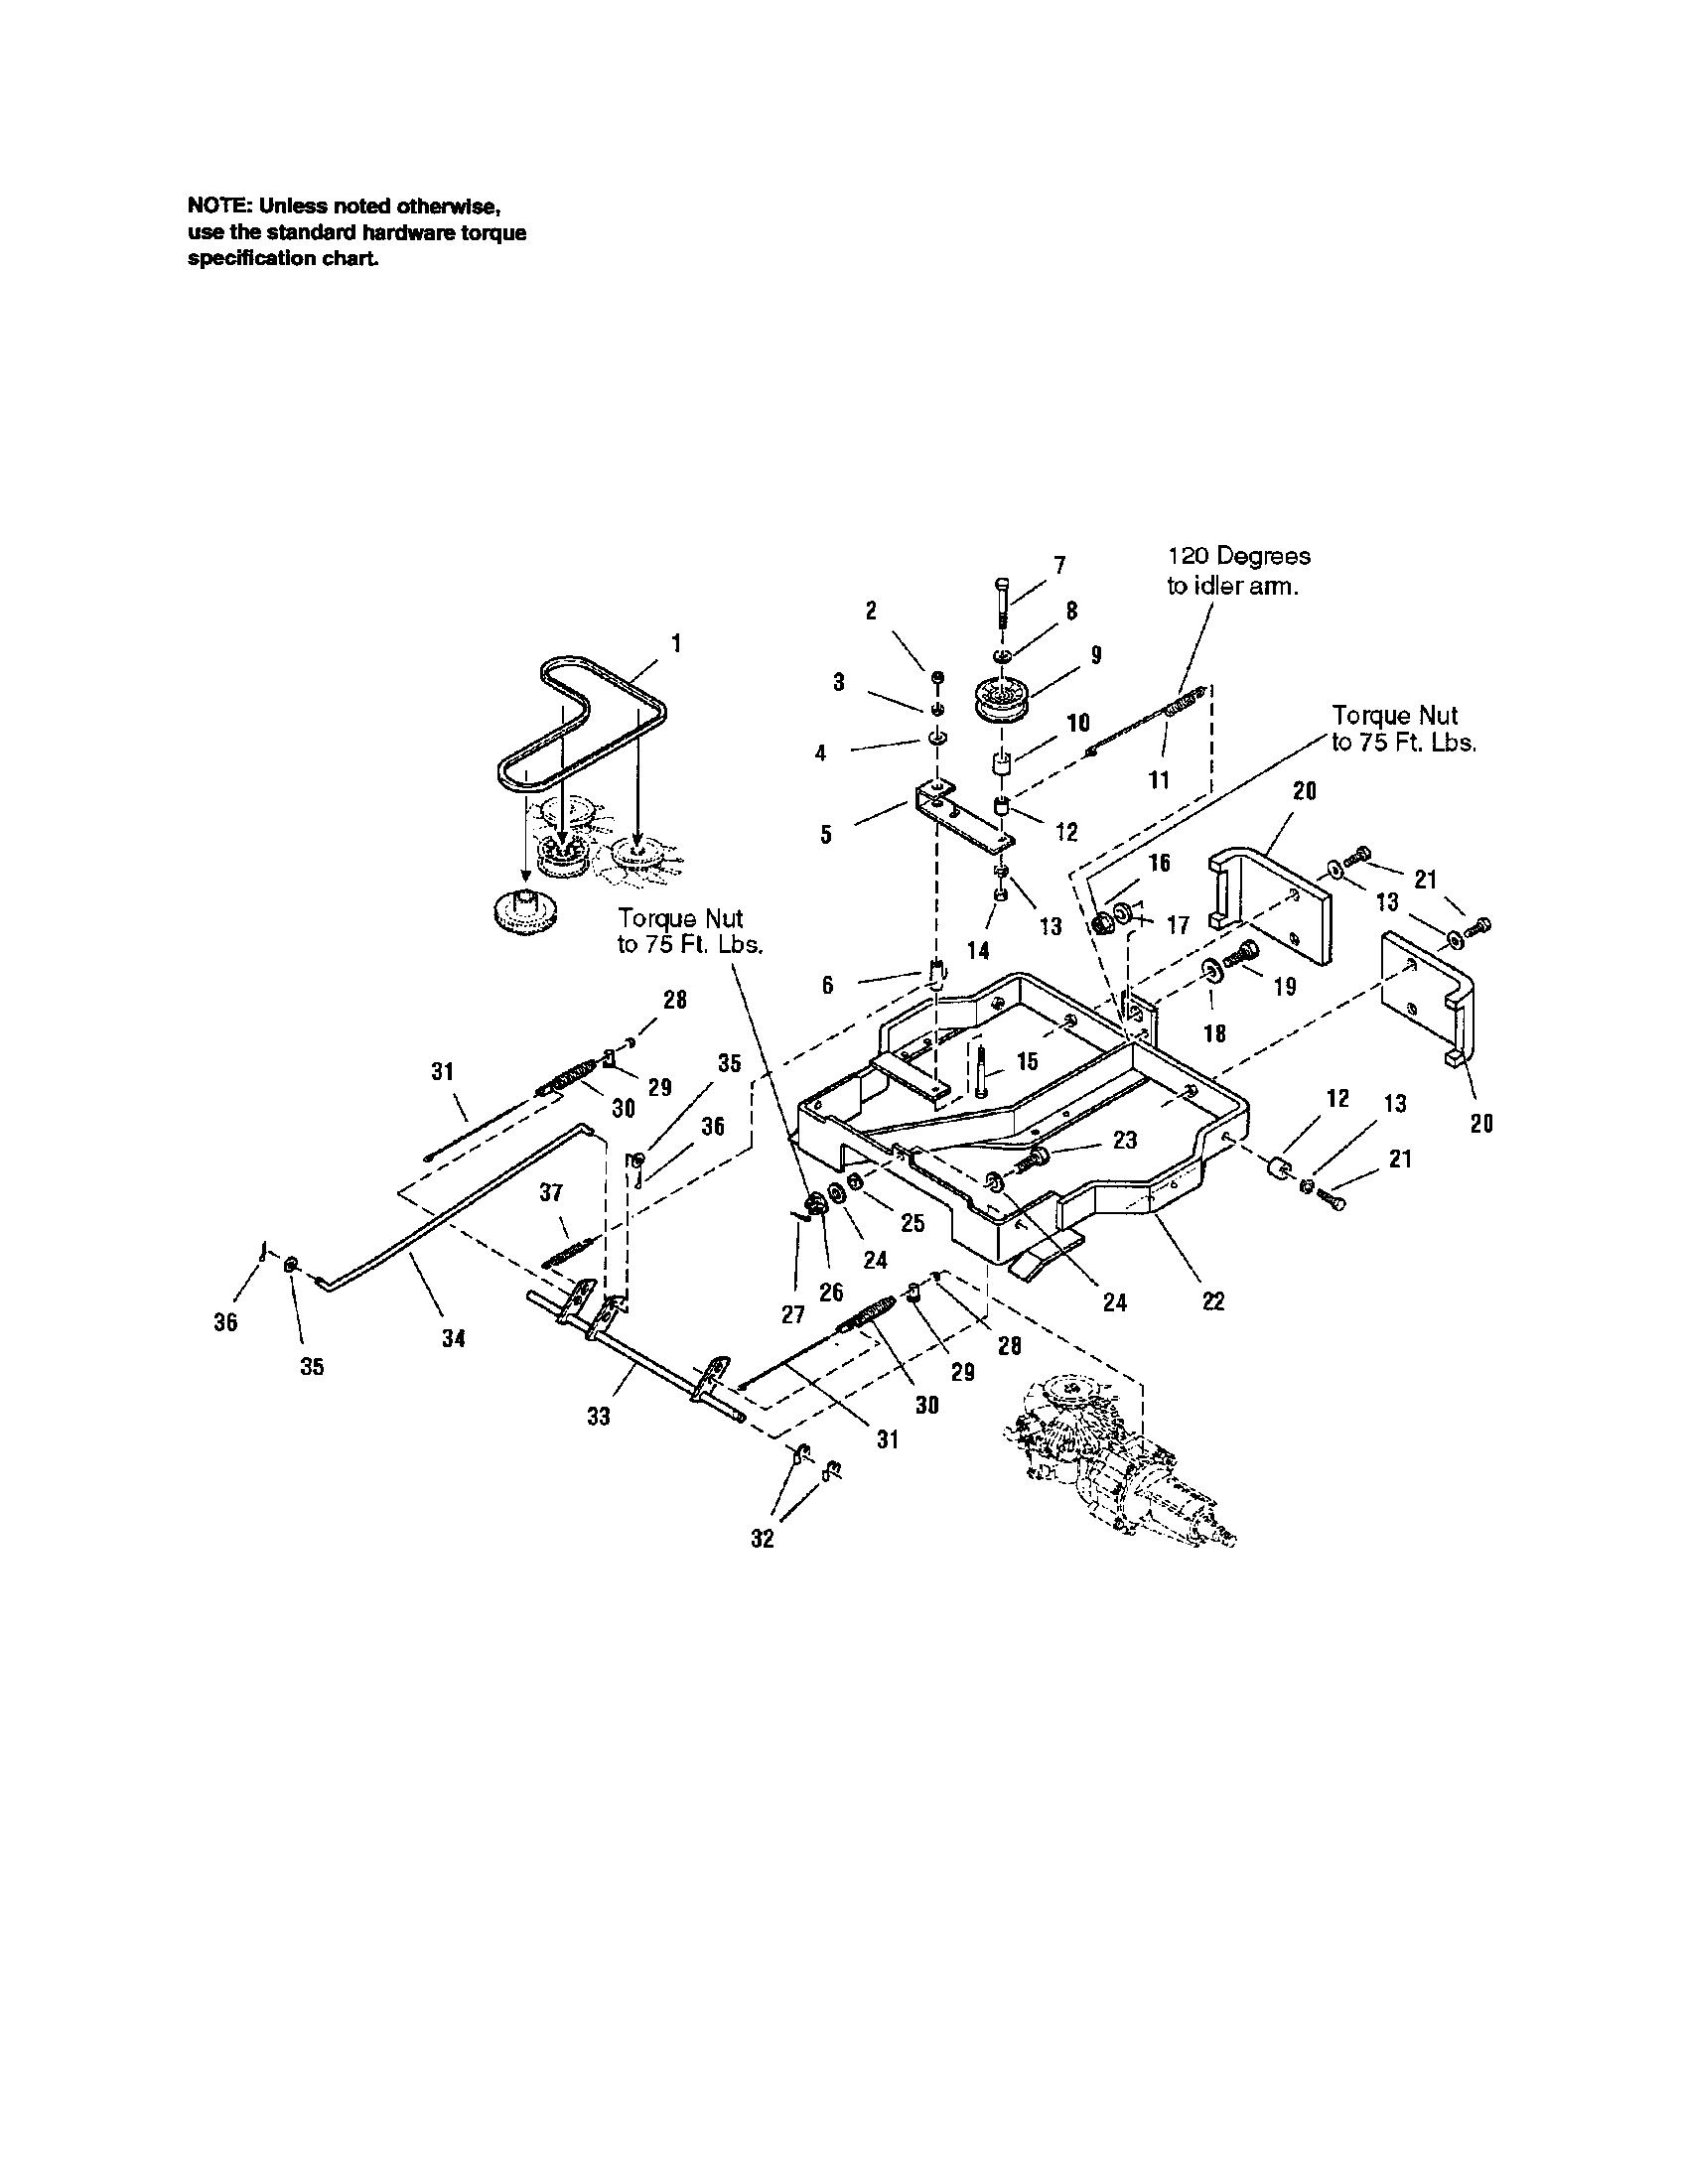 Craftsman model 107277700 lawn, riding mower rear engine